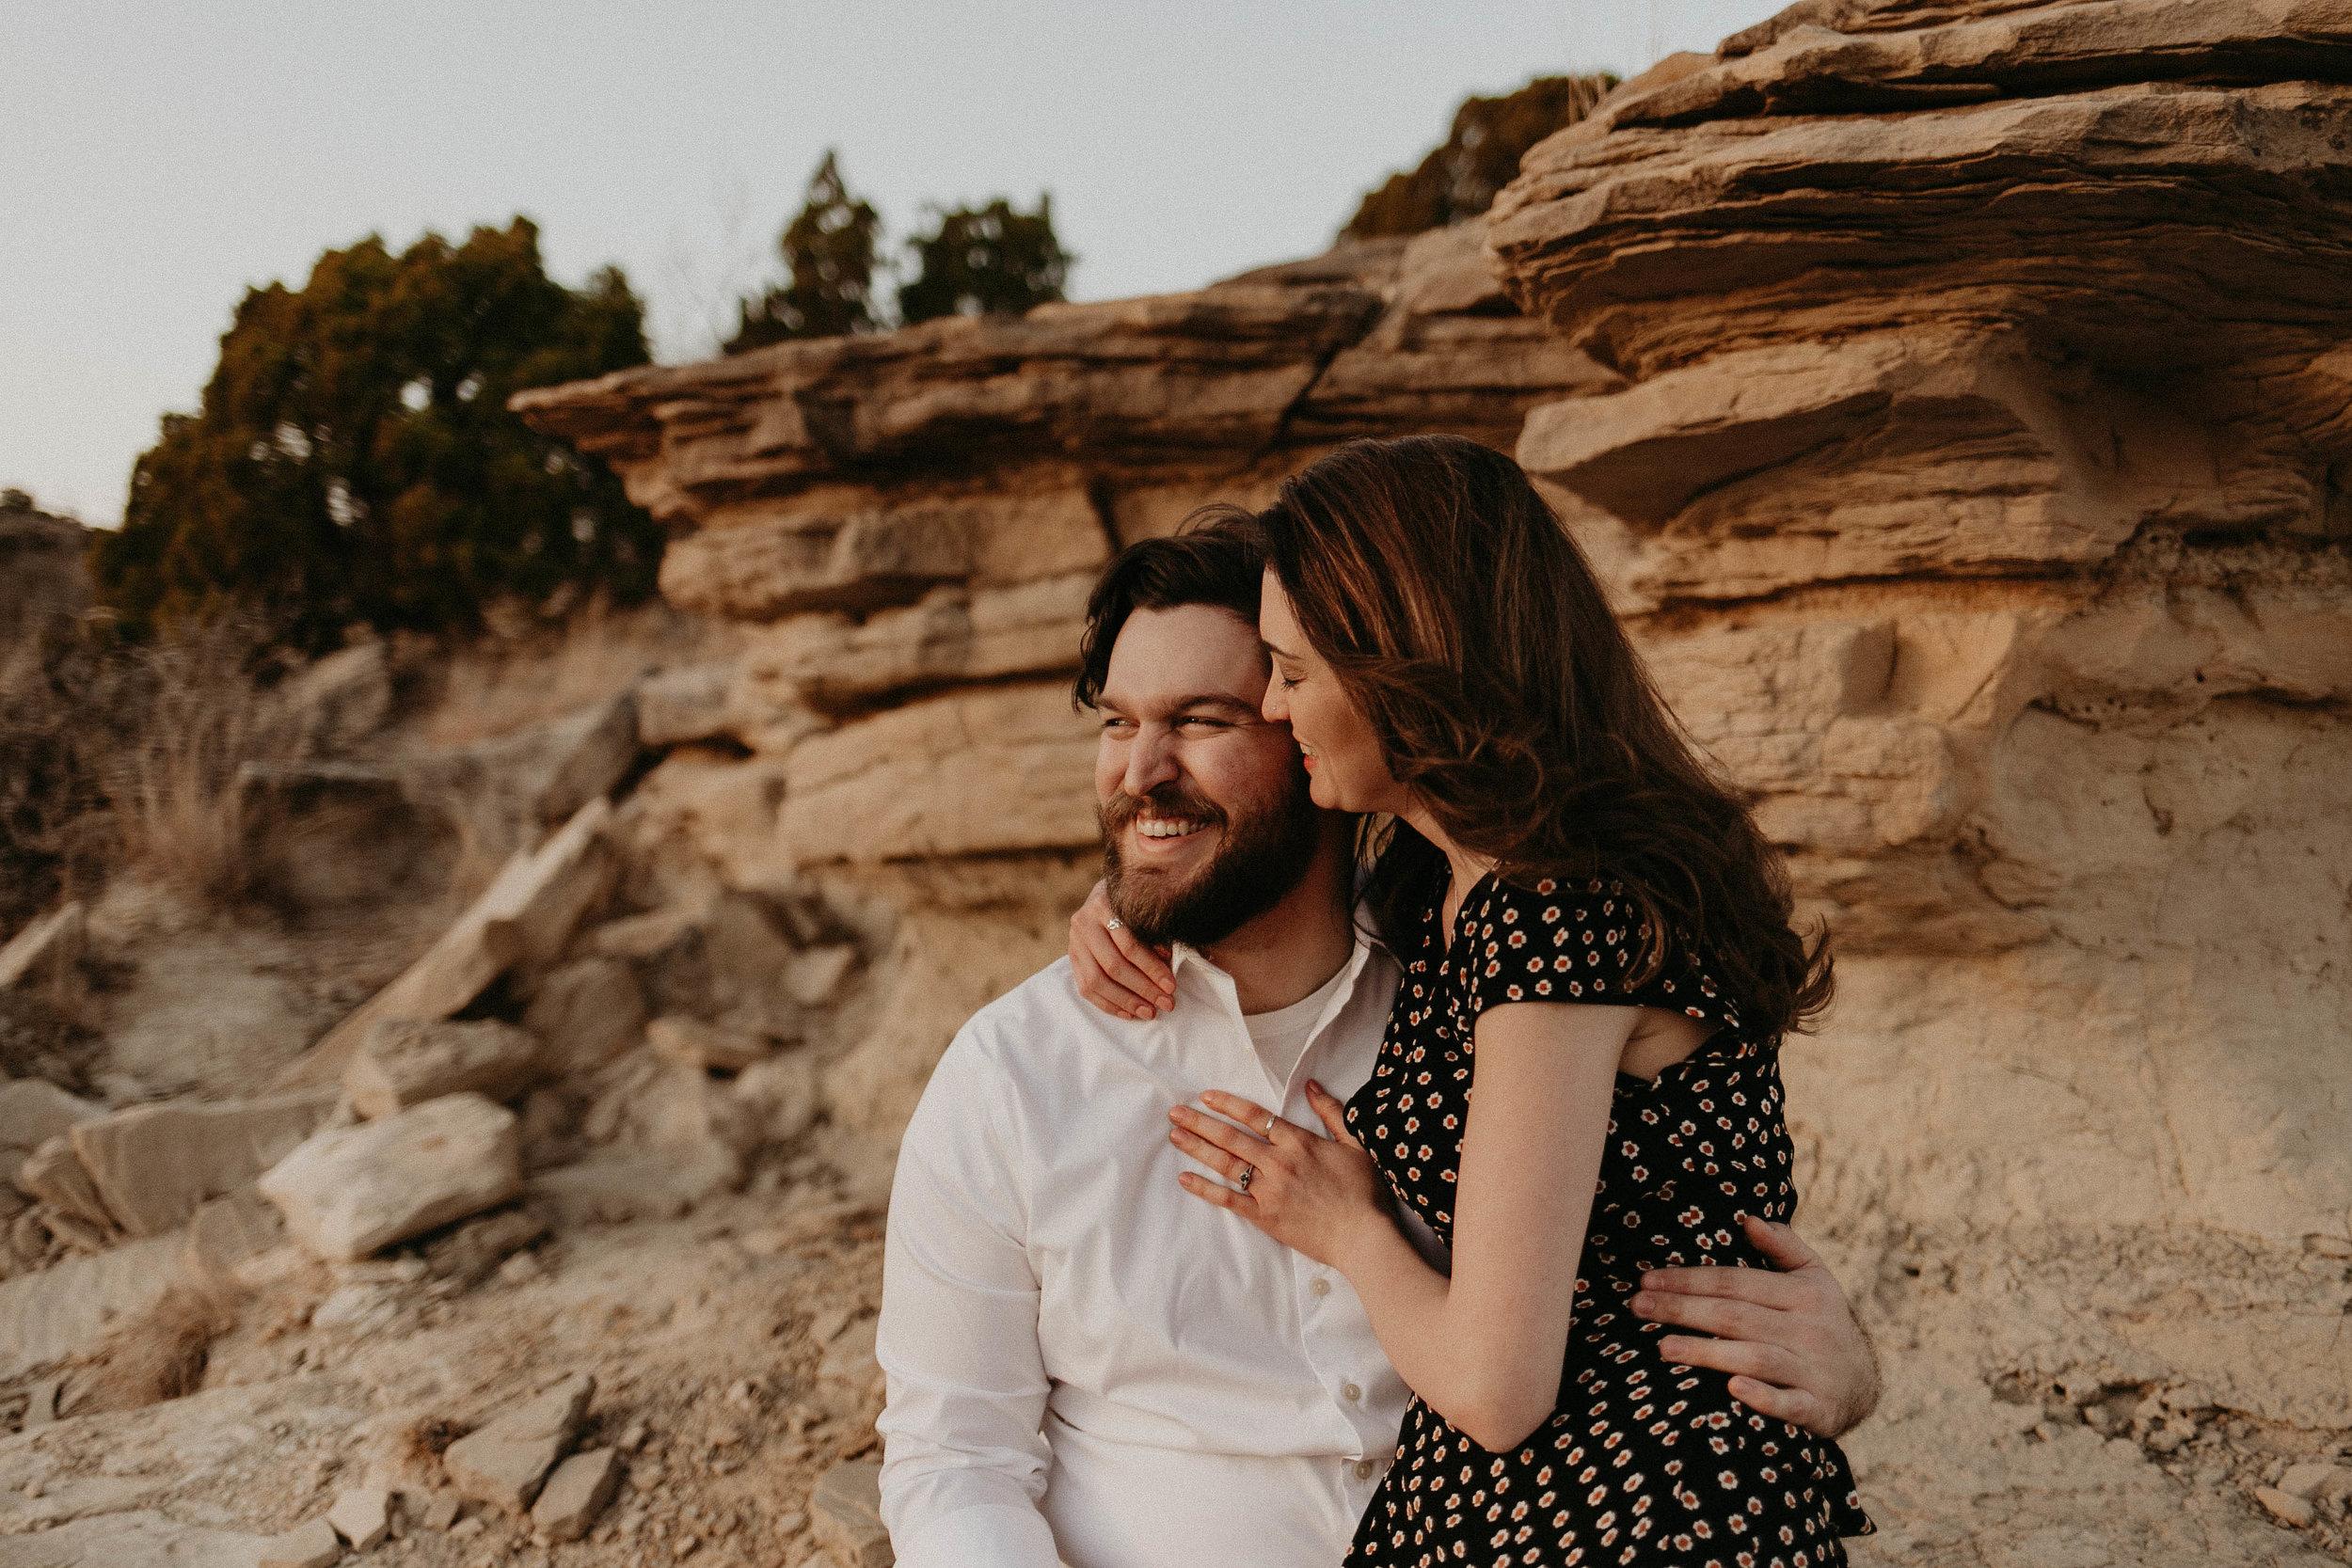 Best Wedding Photographer in Lubbock Texas | Kailee Ann Photography | Best Senior Portrait Photographer in Lubbock Texas | Kailee Ann Photography Adventurous Wedding & Portrait Photographer